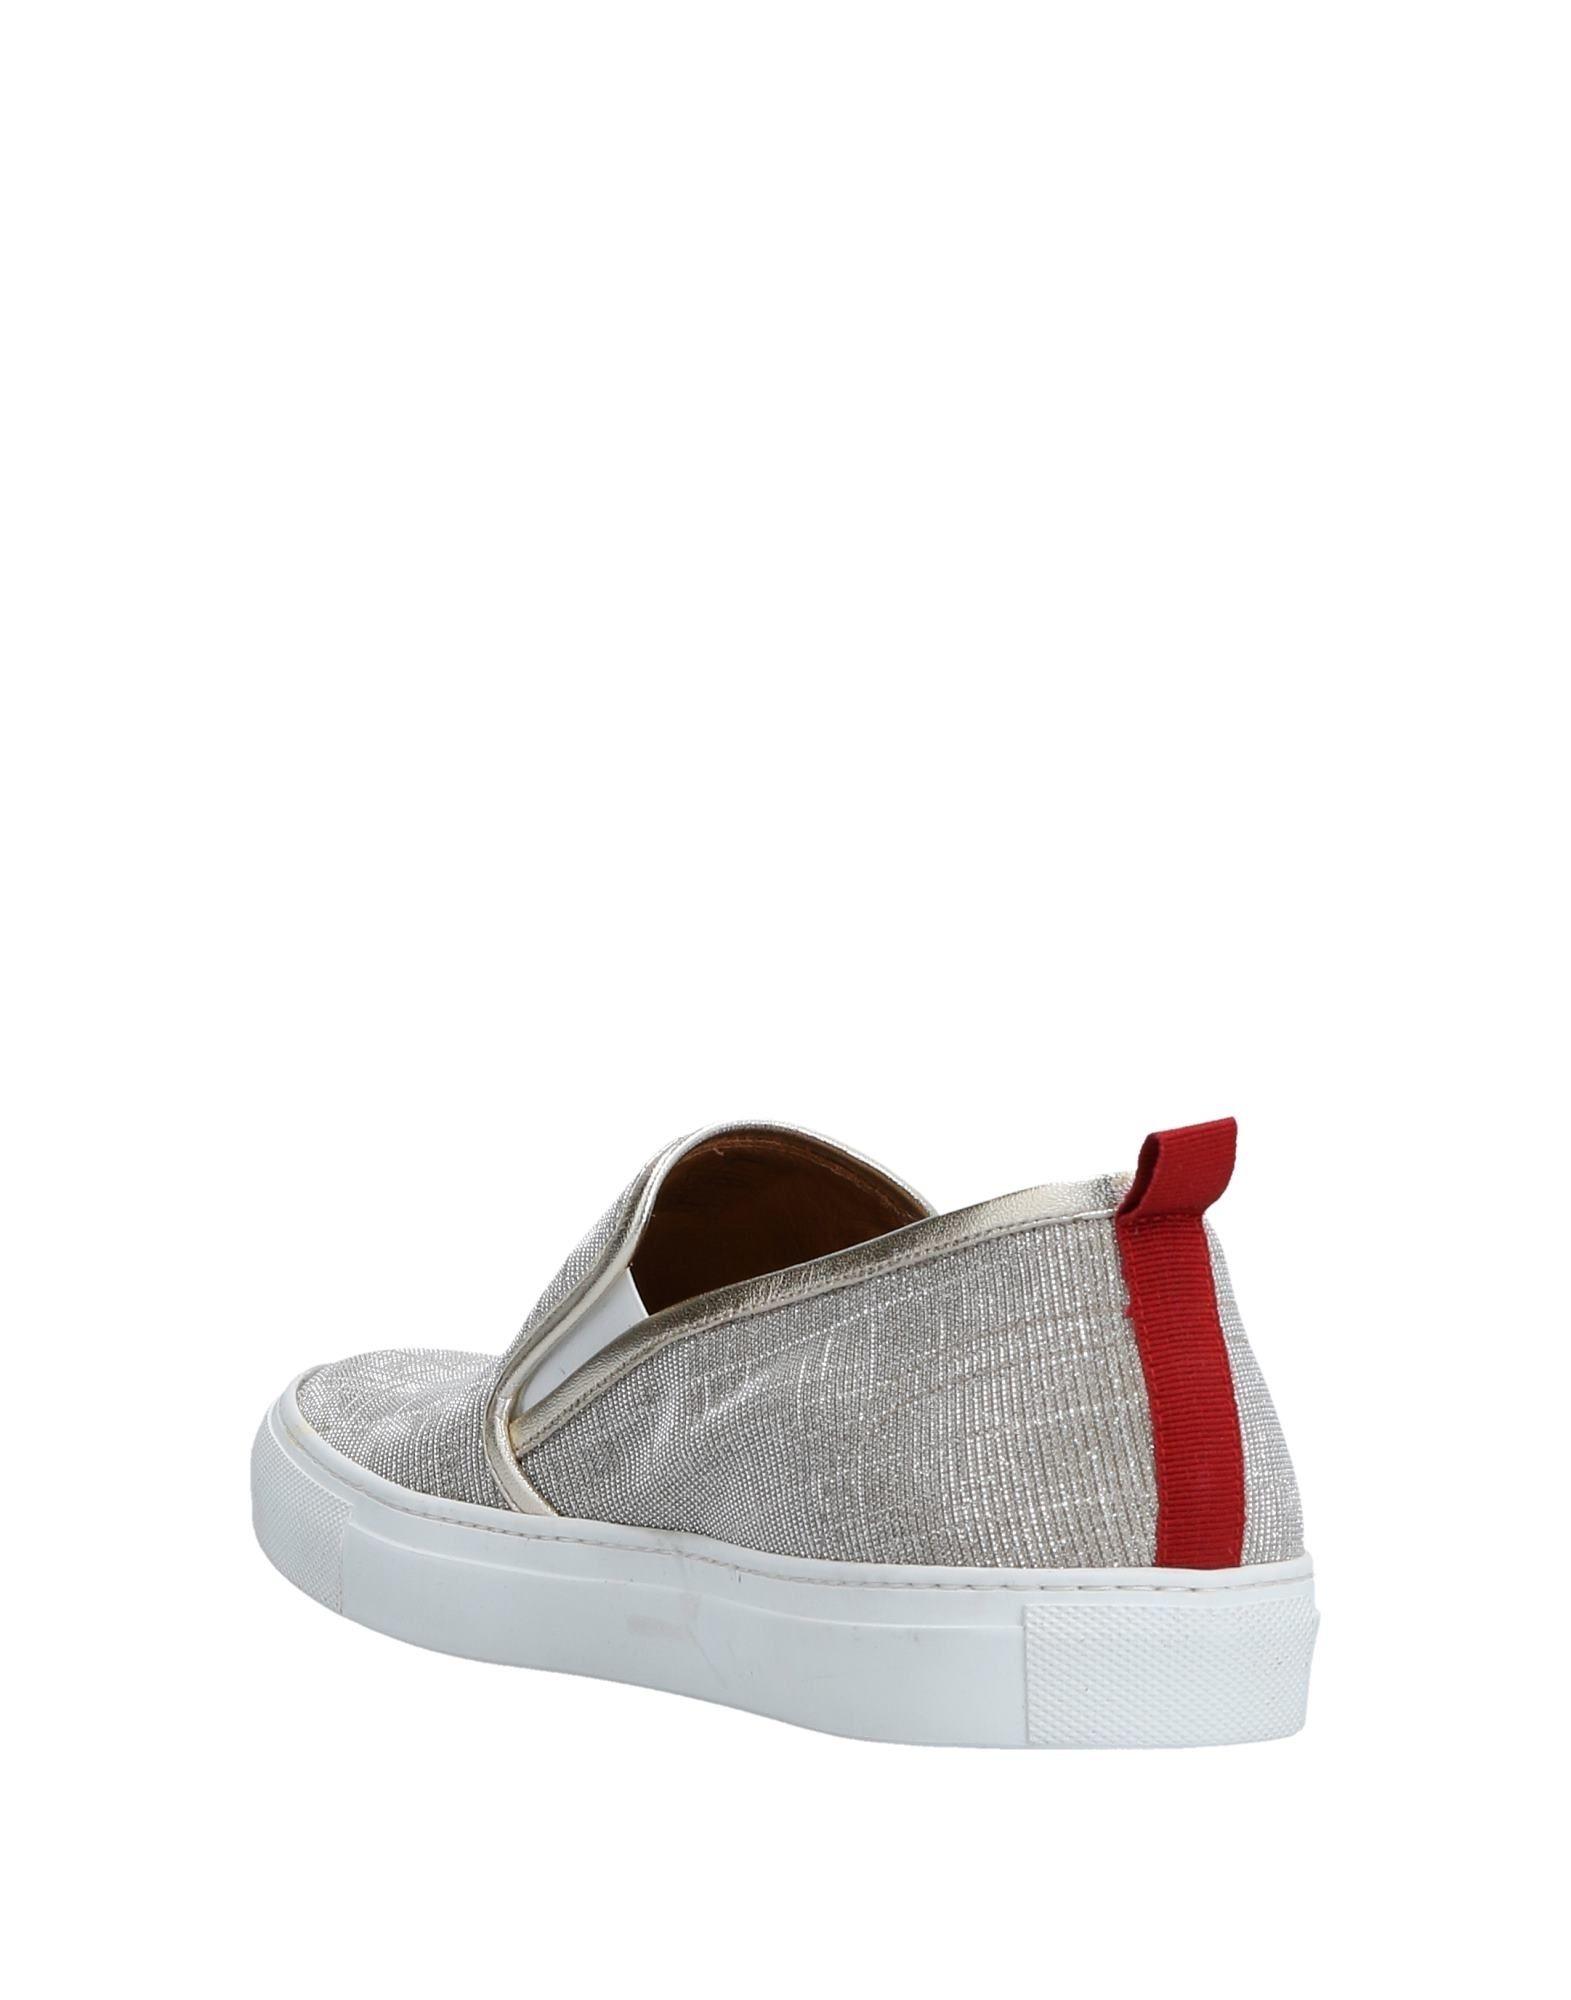 Via 11531378DC Roma 15 Sneakers Damen  11531378DC Via Gute Qualität beliebte Schuhe 95ac20